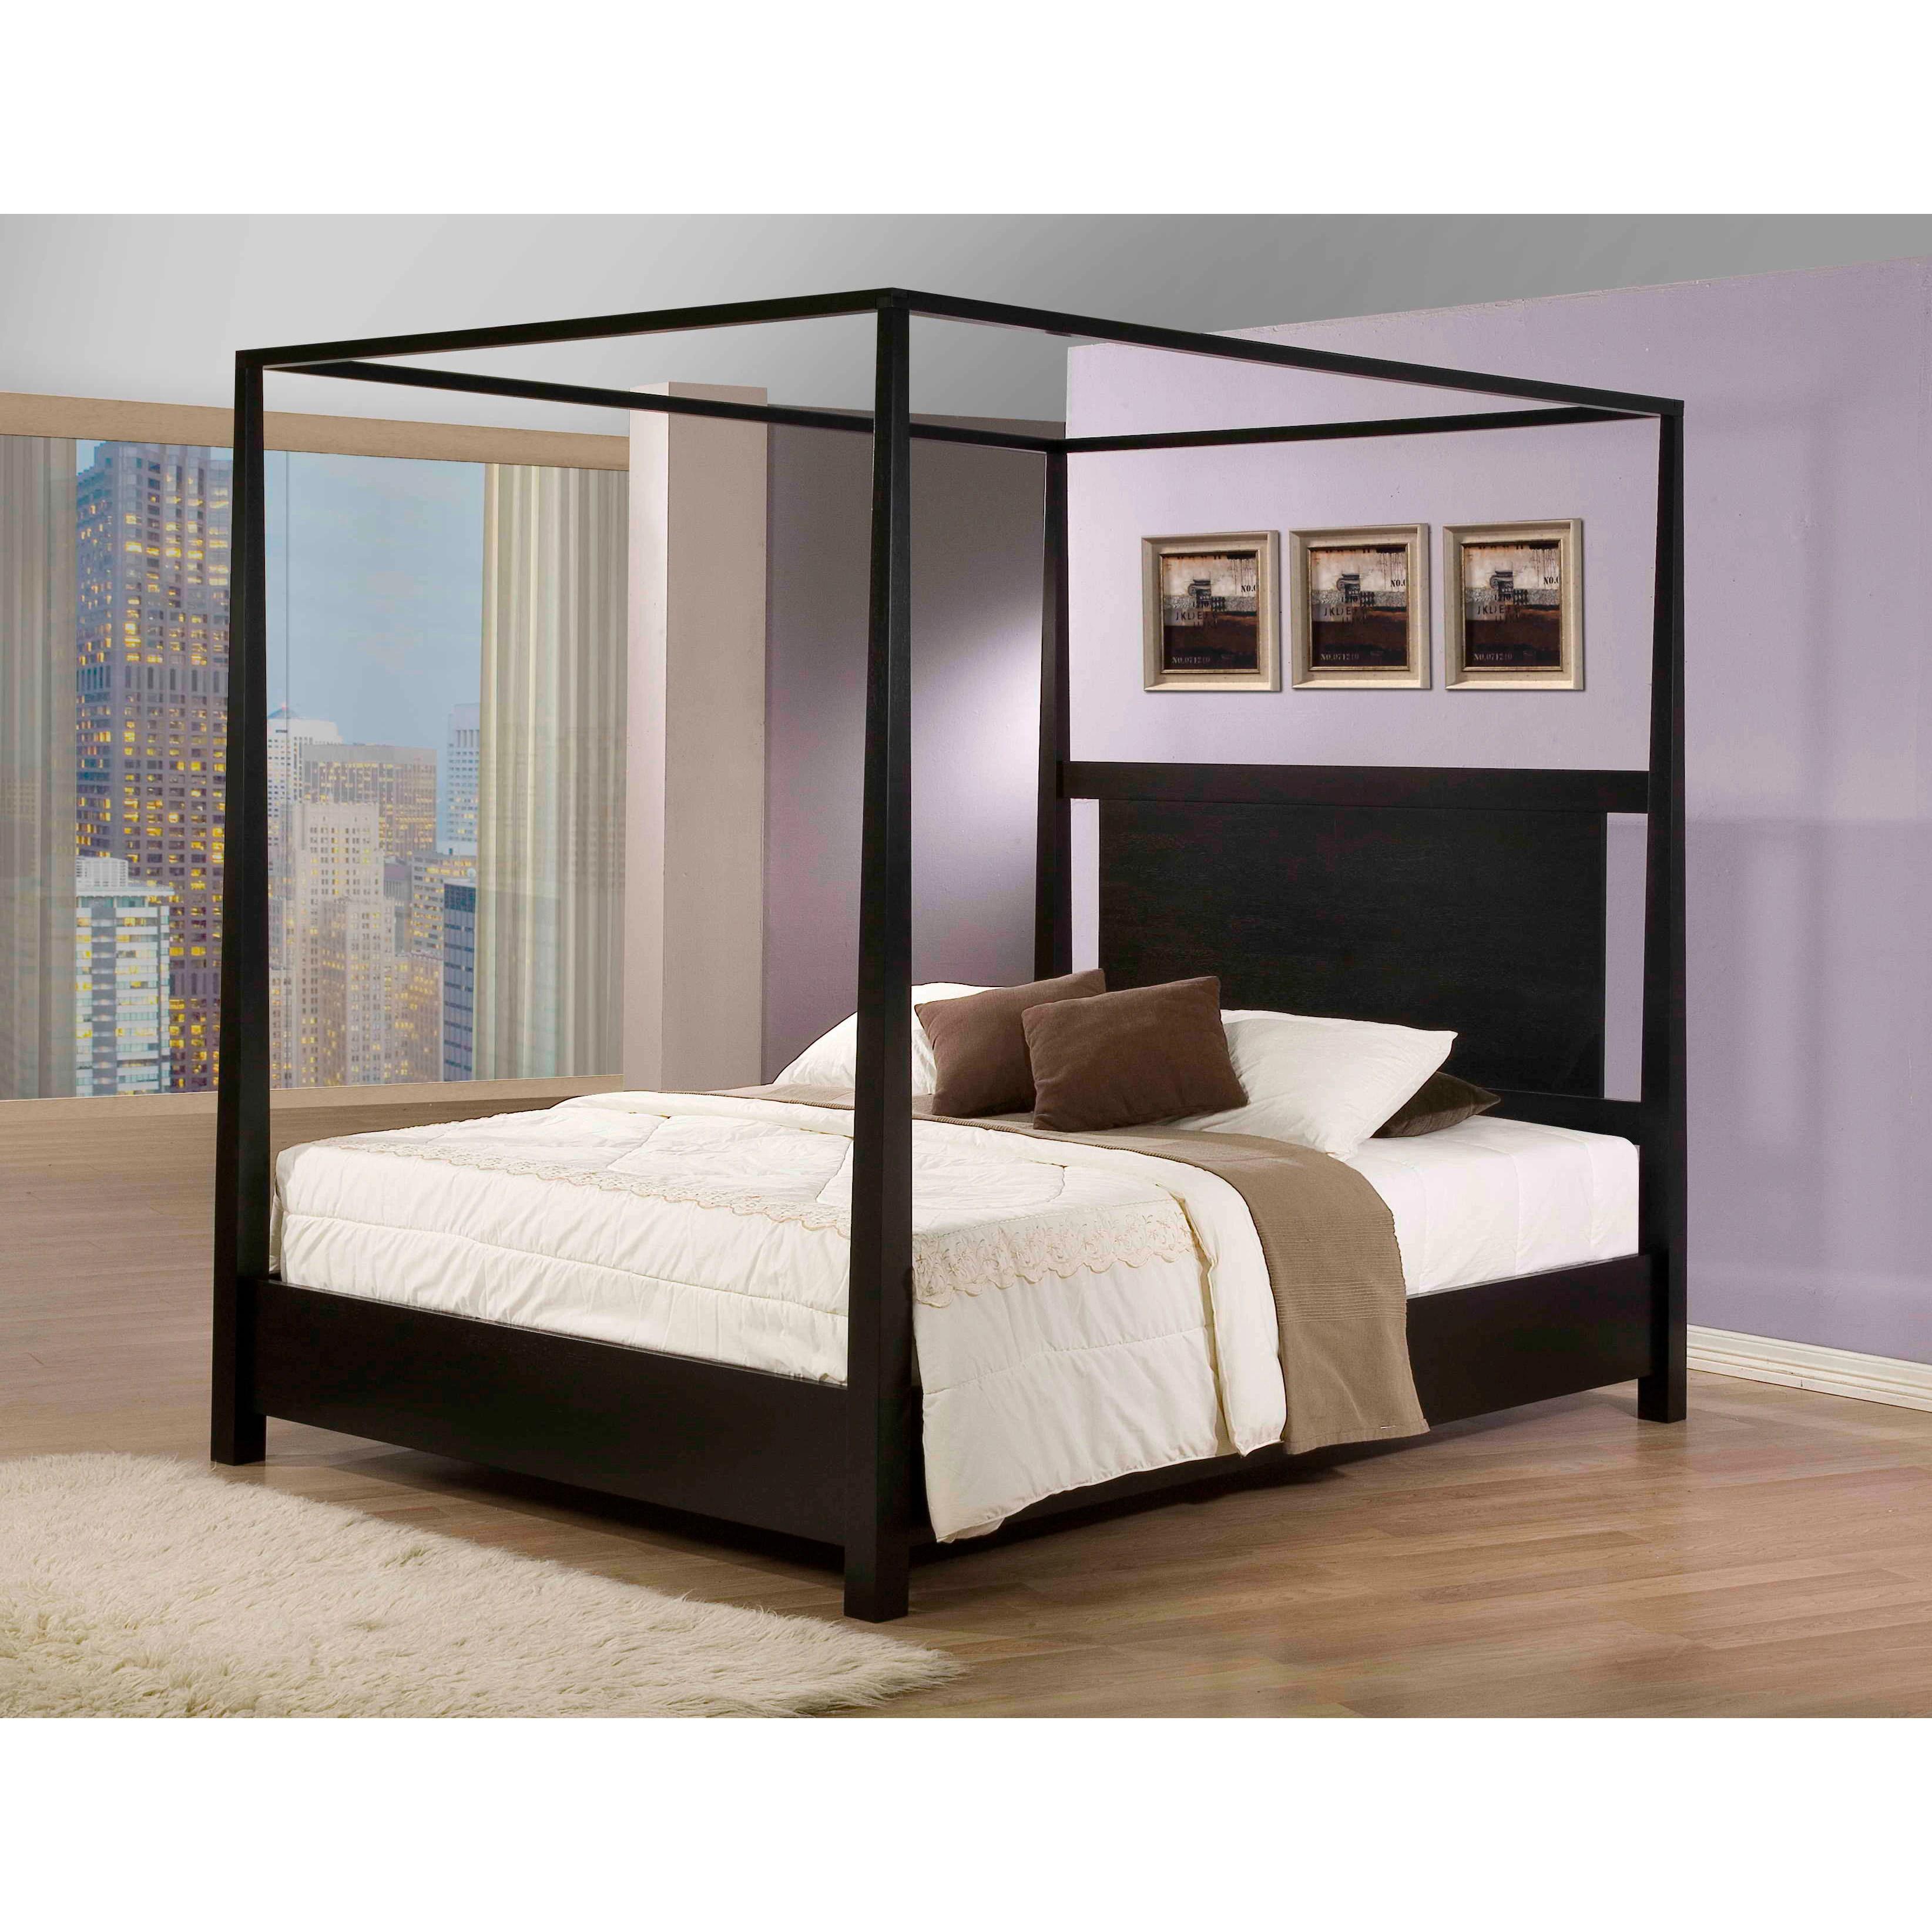 Shop Napa Canopy King Bed